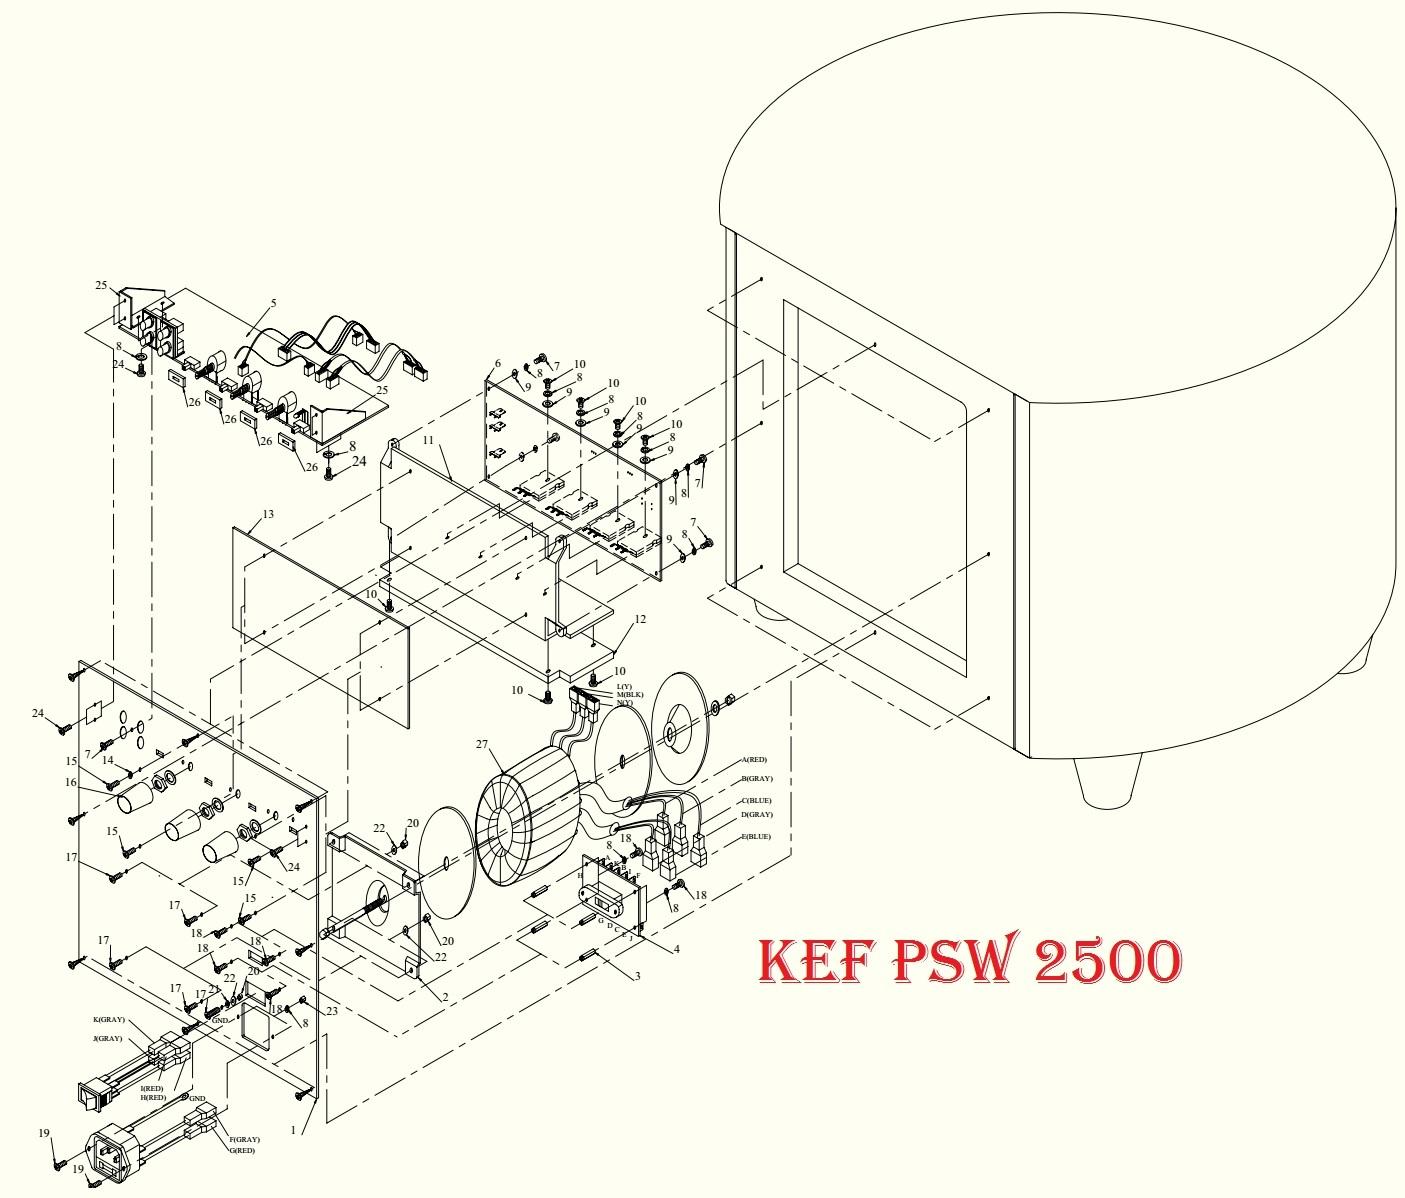 kef psw 2500 powered sub